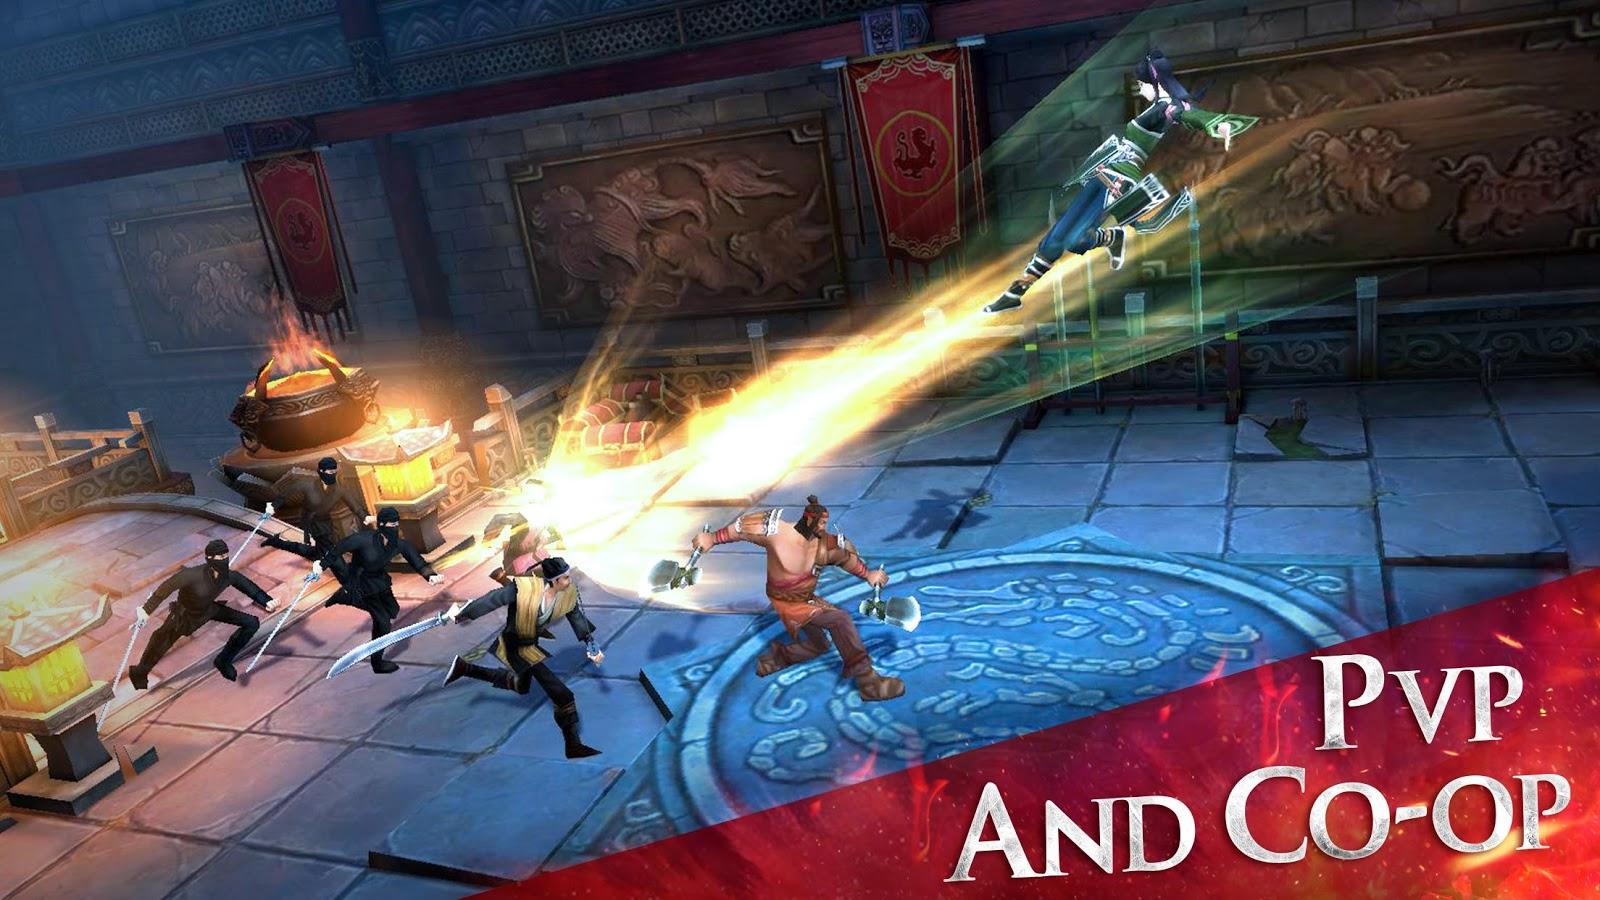 Age of Wushu Dynasty V 1.4 Apk Mod Mega. Google Play